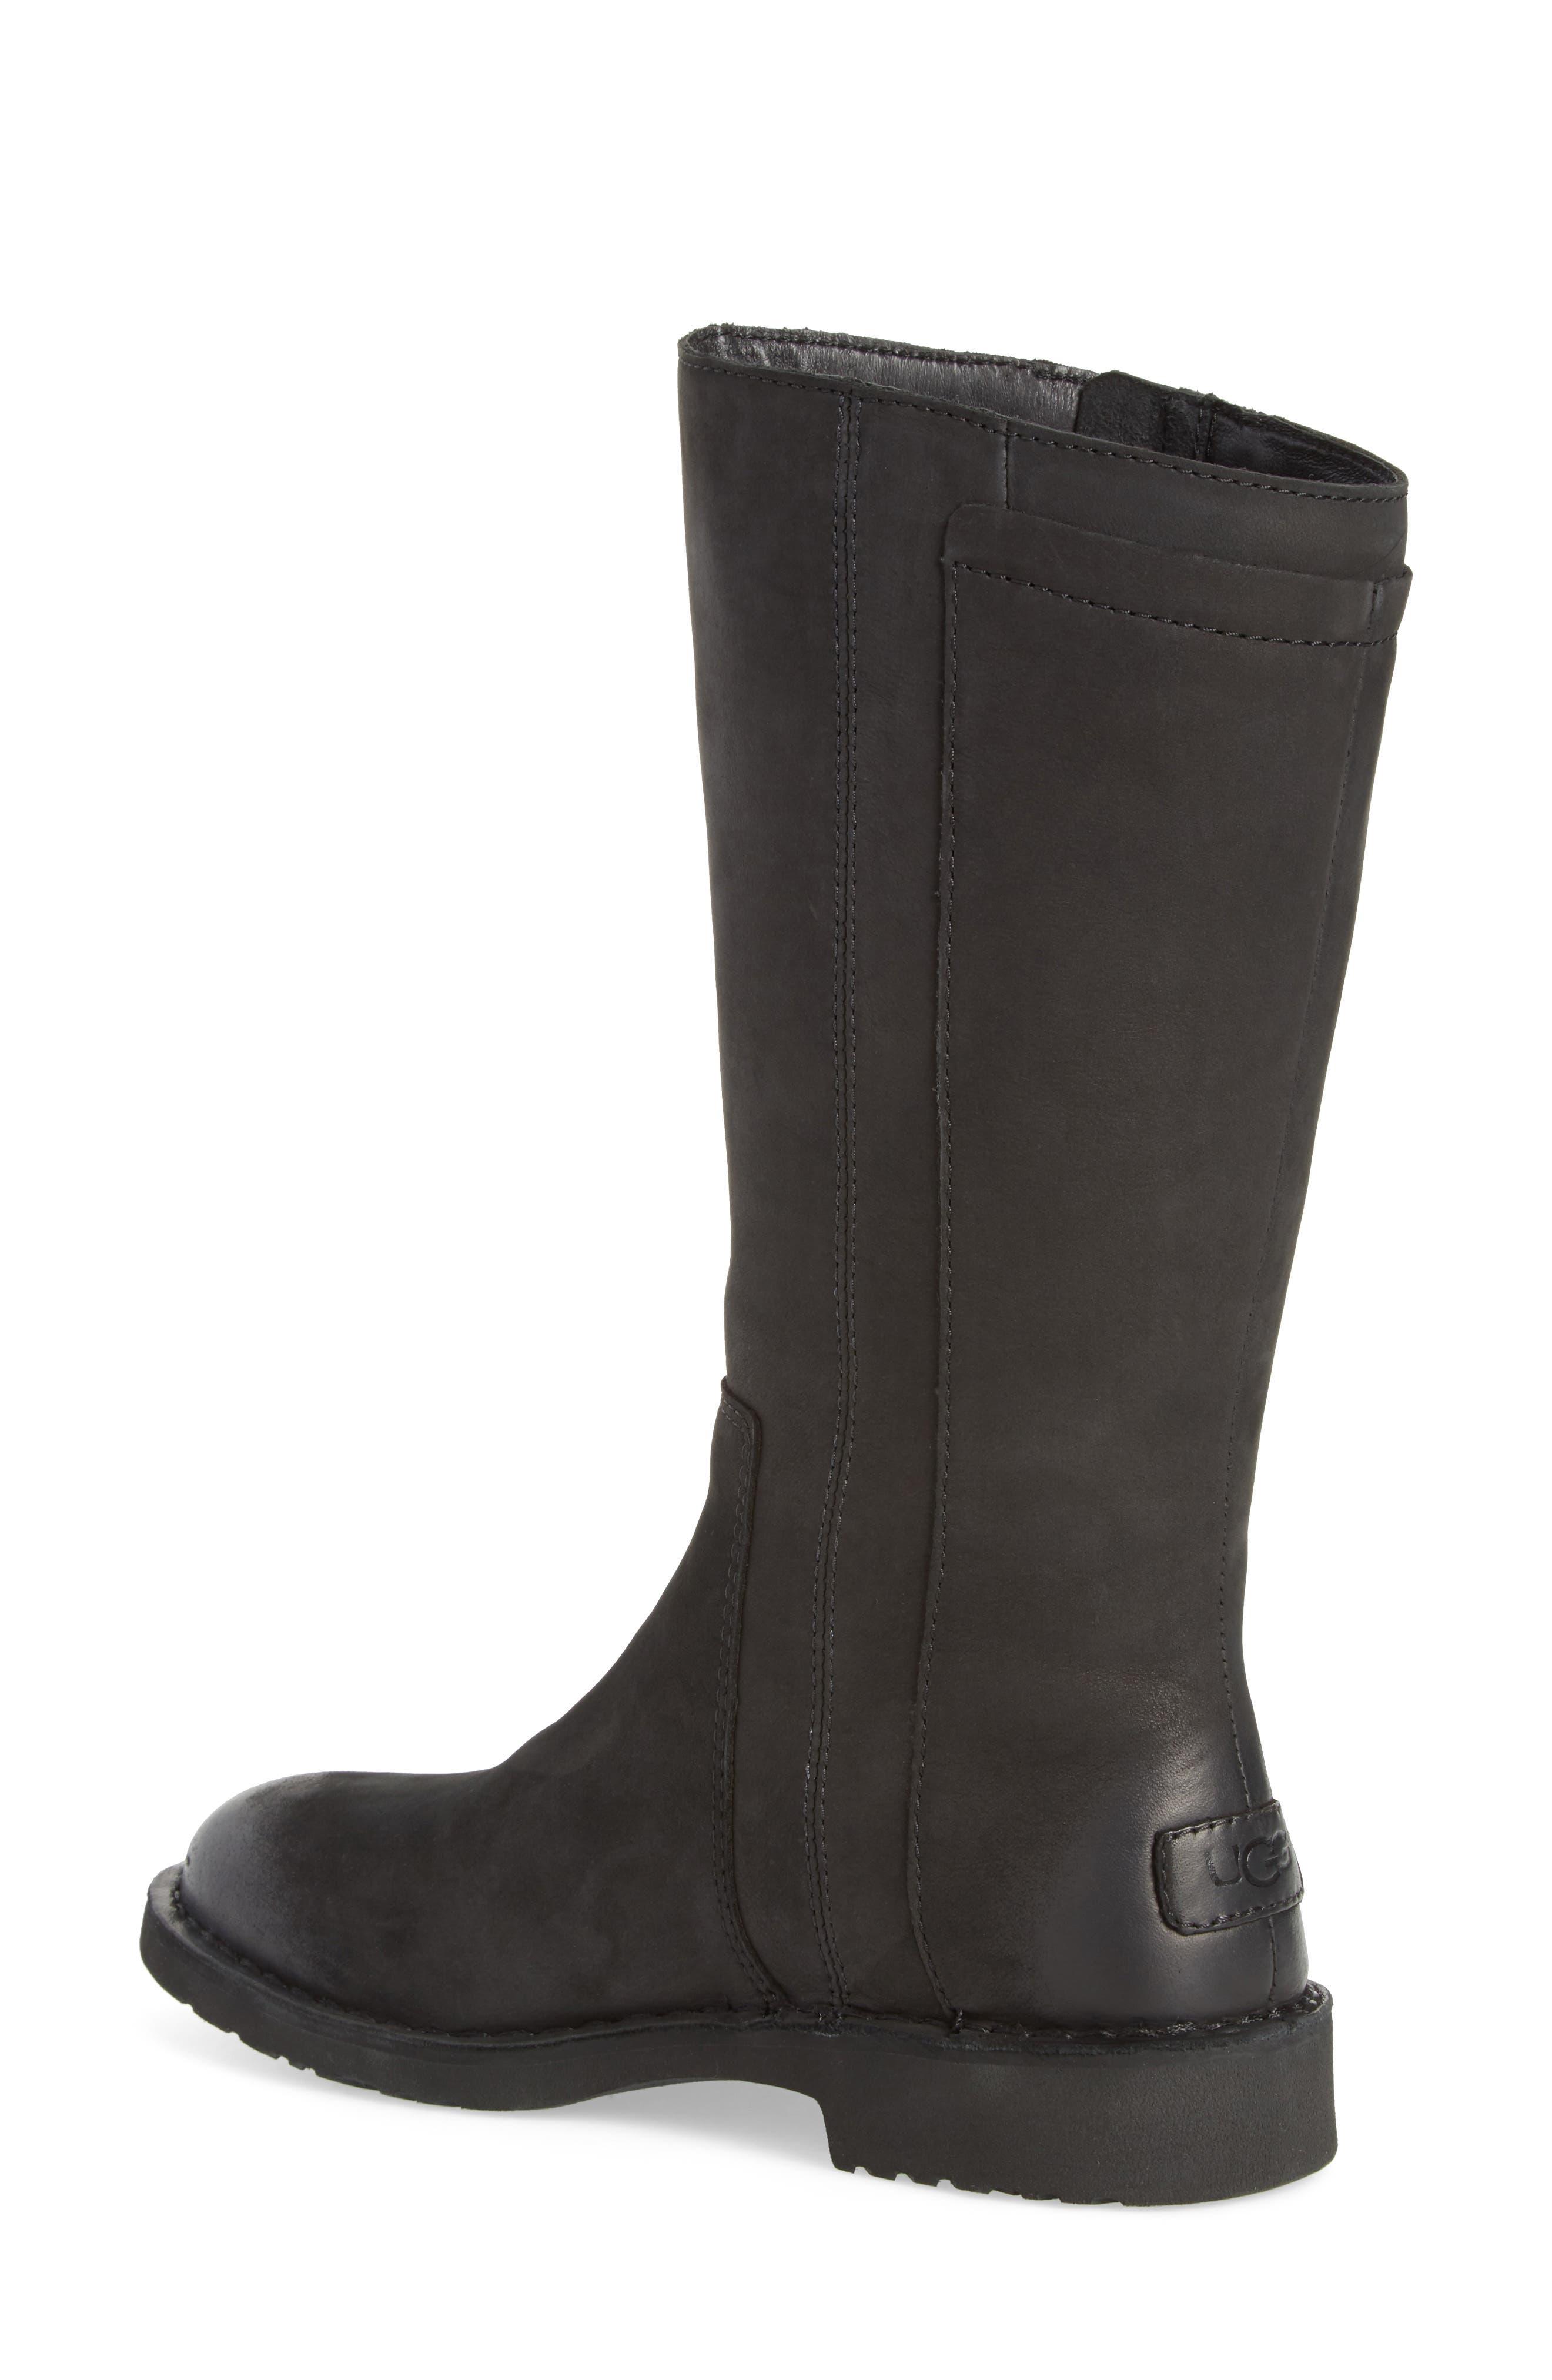 Elly Boot,                             Alternate thumbnail 2, color,                             Black Nubuck Leather